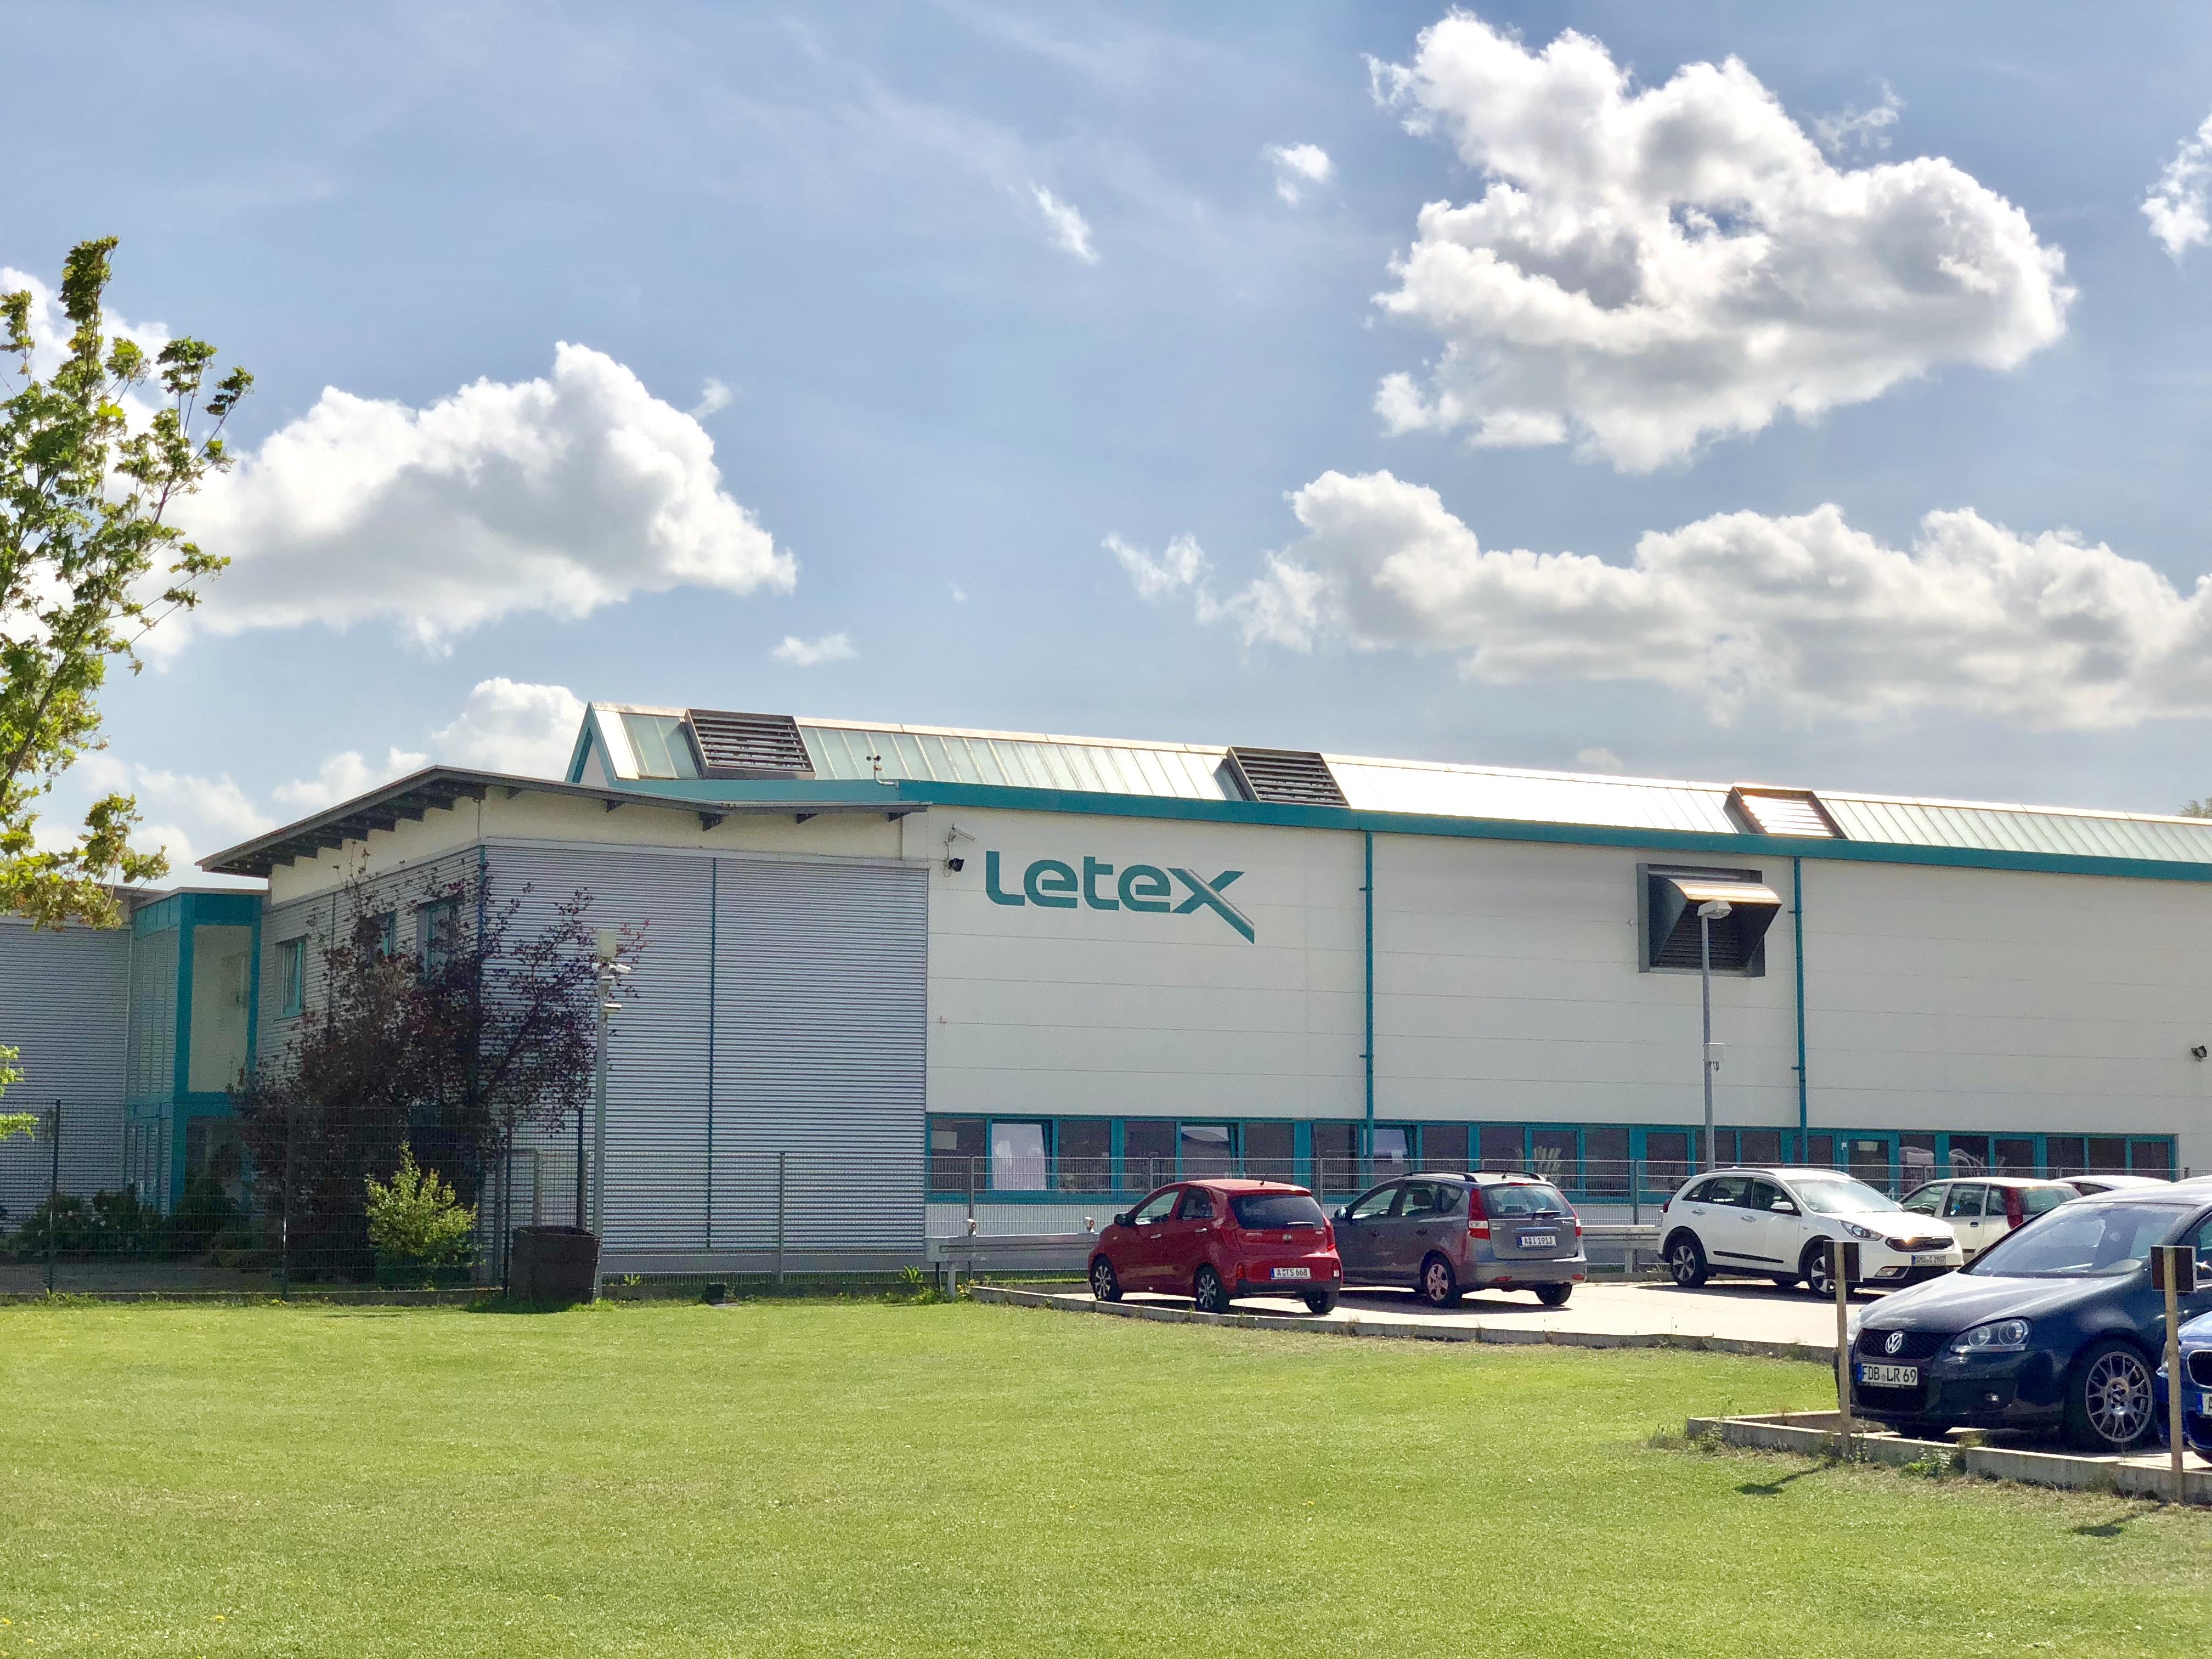 Letex Spezialgarne GmbH Augsburg